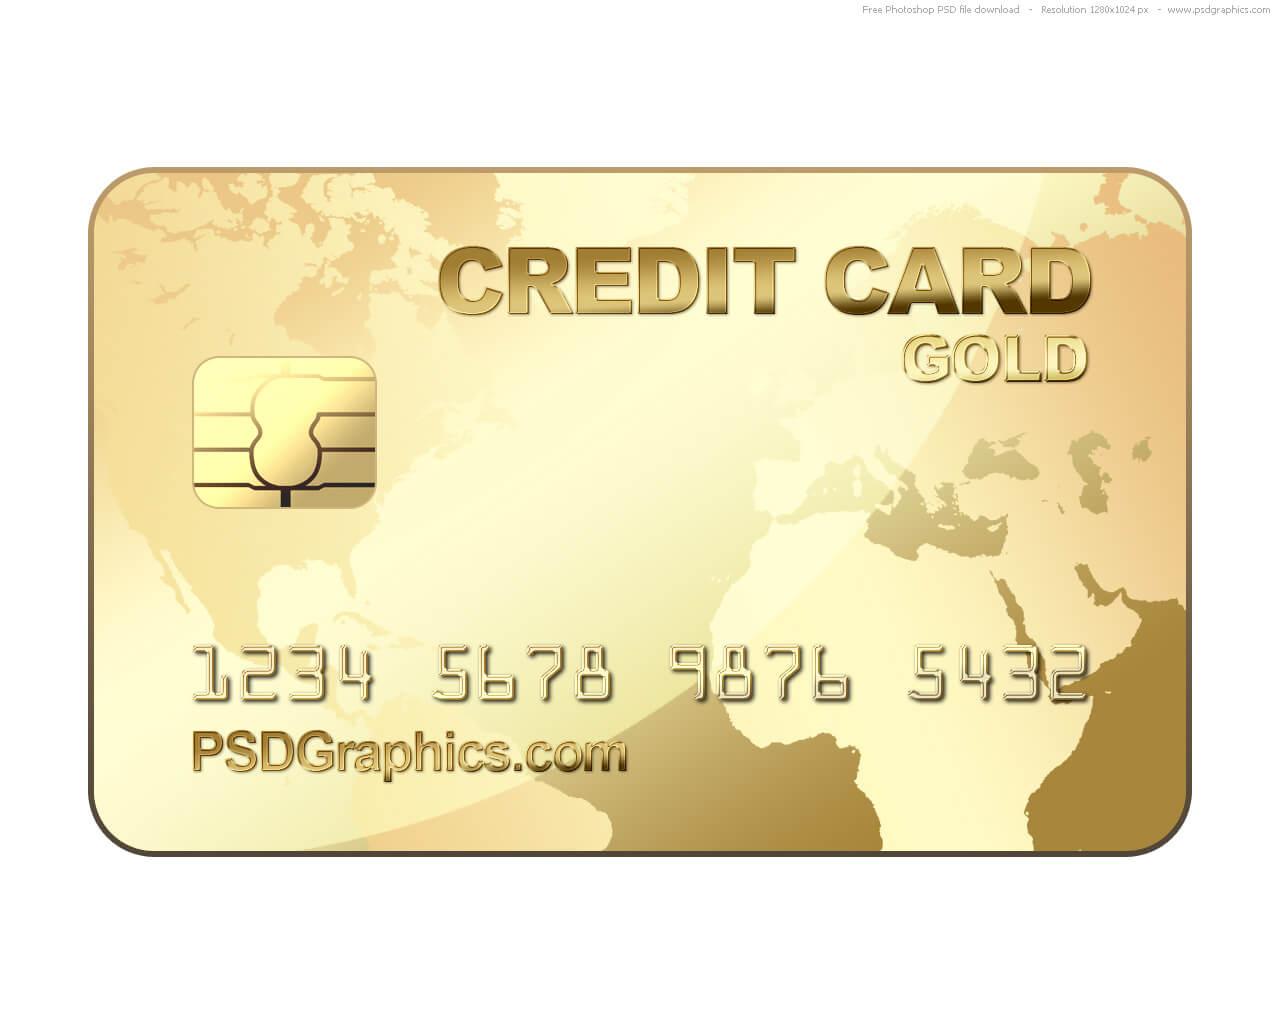 Printable Credit Cards #ud23 – Advancedmassagebysara with Credit Card Template For Kids